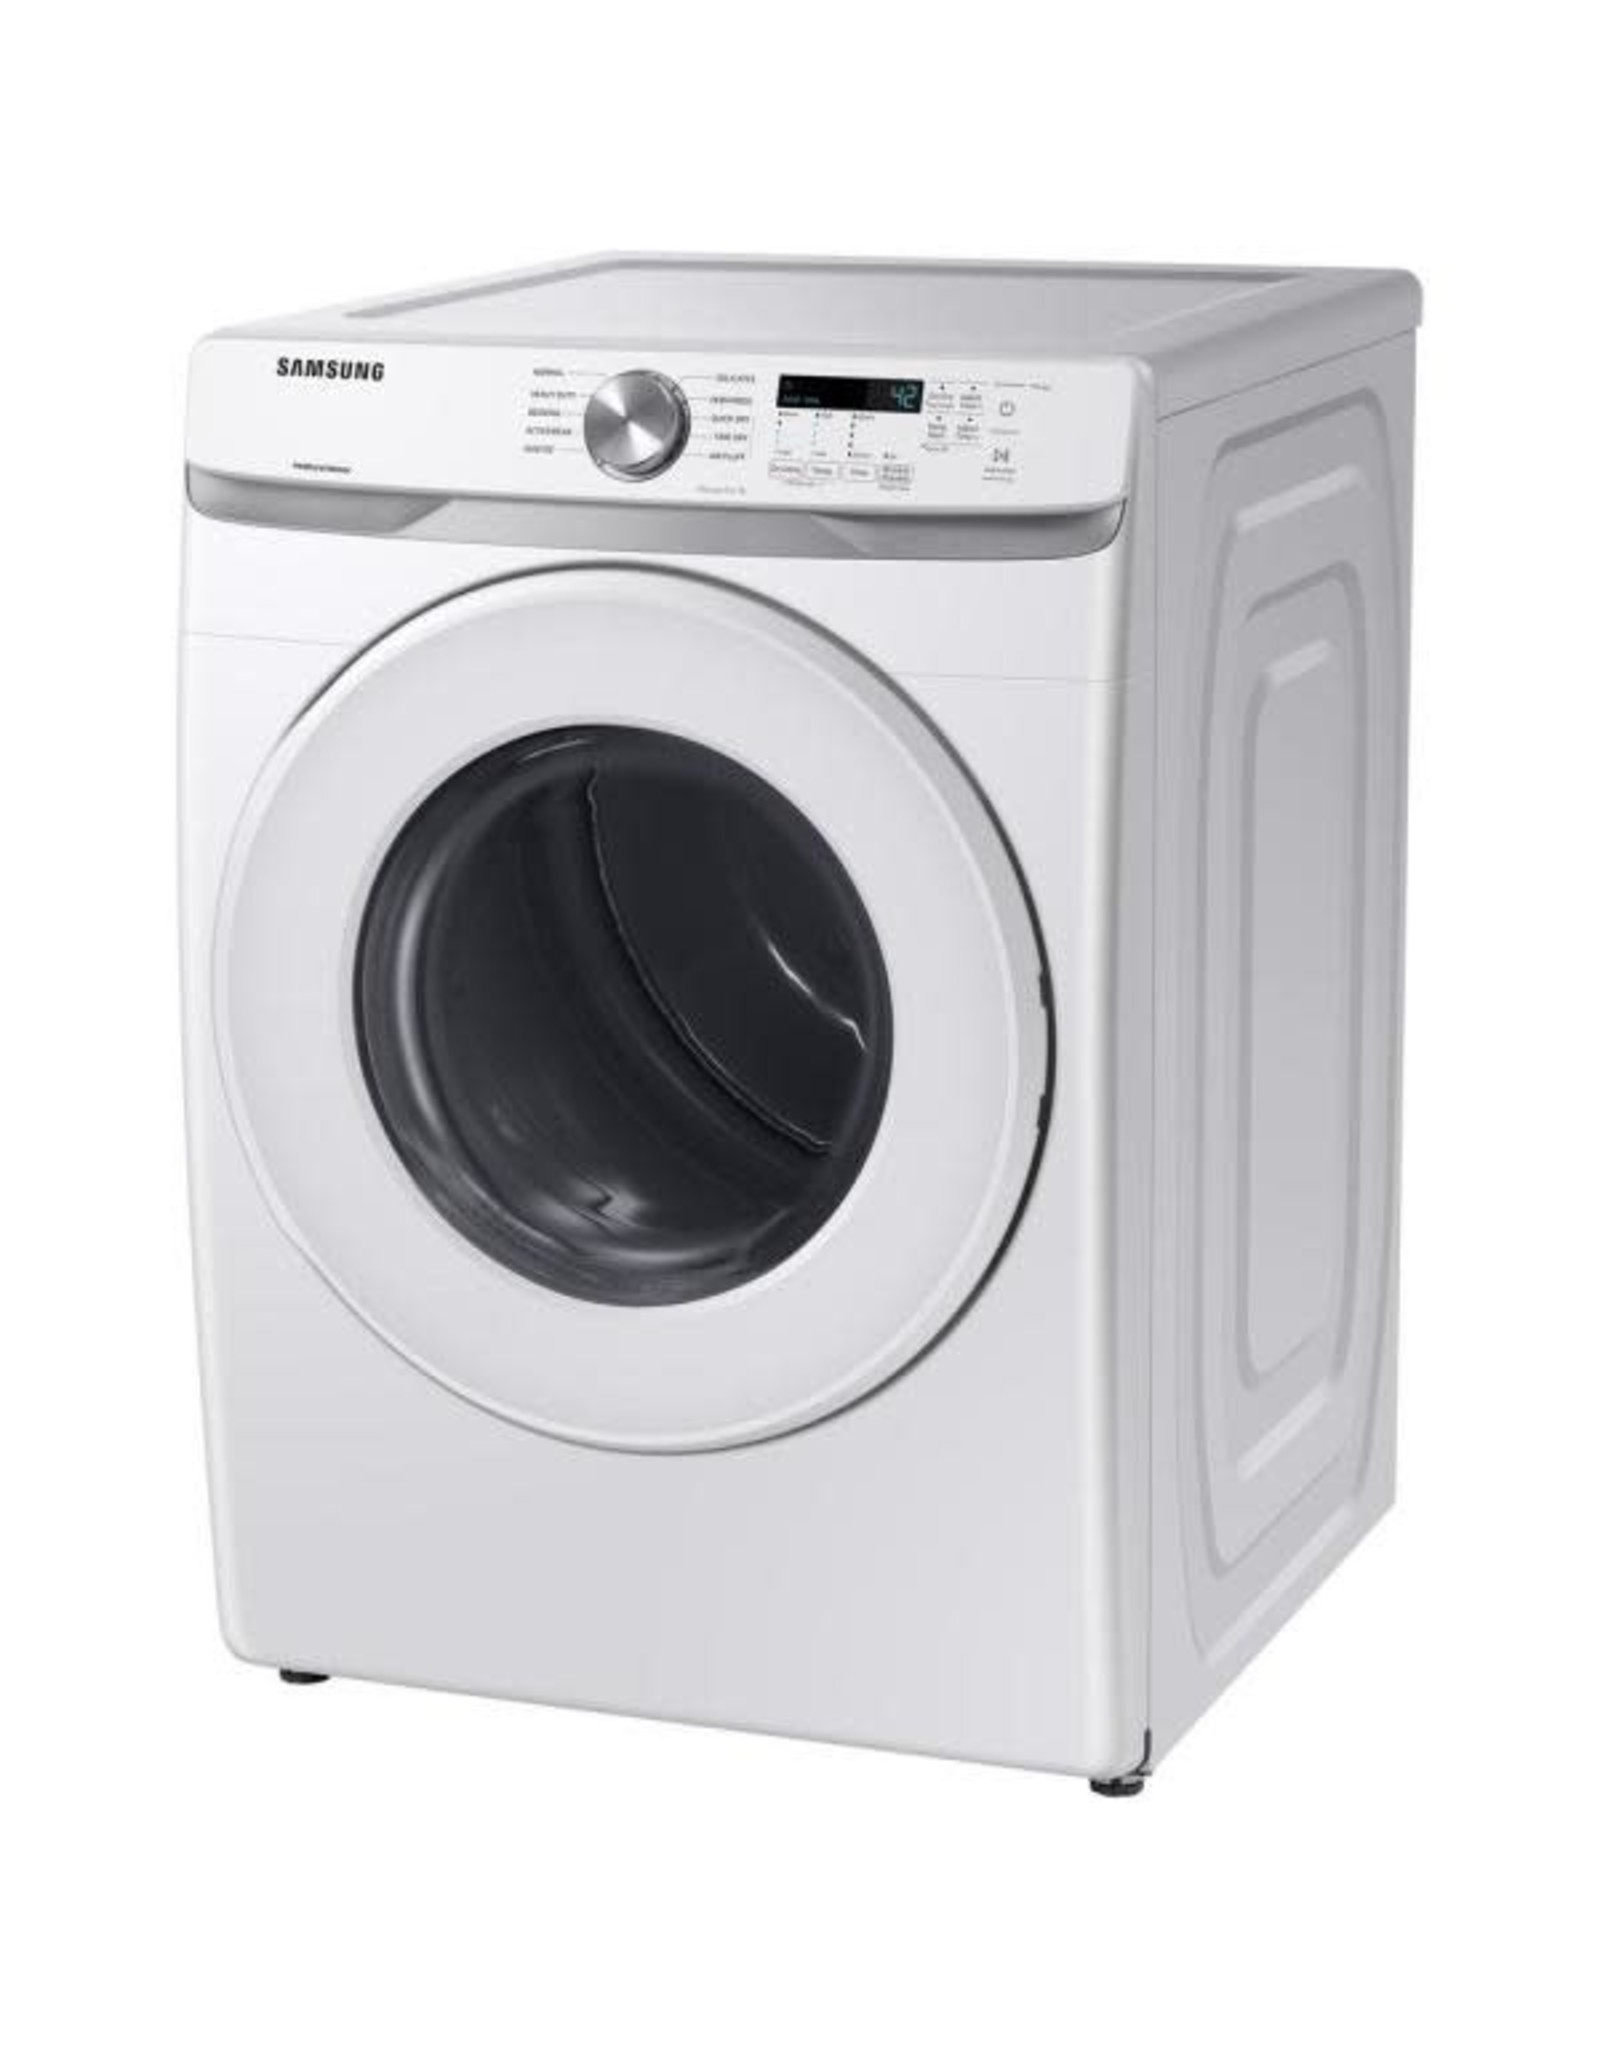 SAMSUNG DVE45T6000W Samsung 7.5 cu. ft. 240-Volt White Electric Dryer with Sensor Dryer (Pedestals Sold Separately)